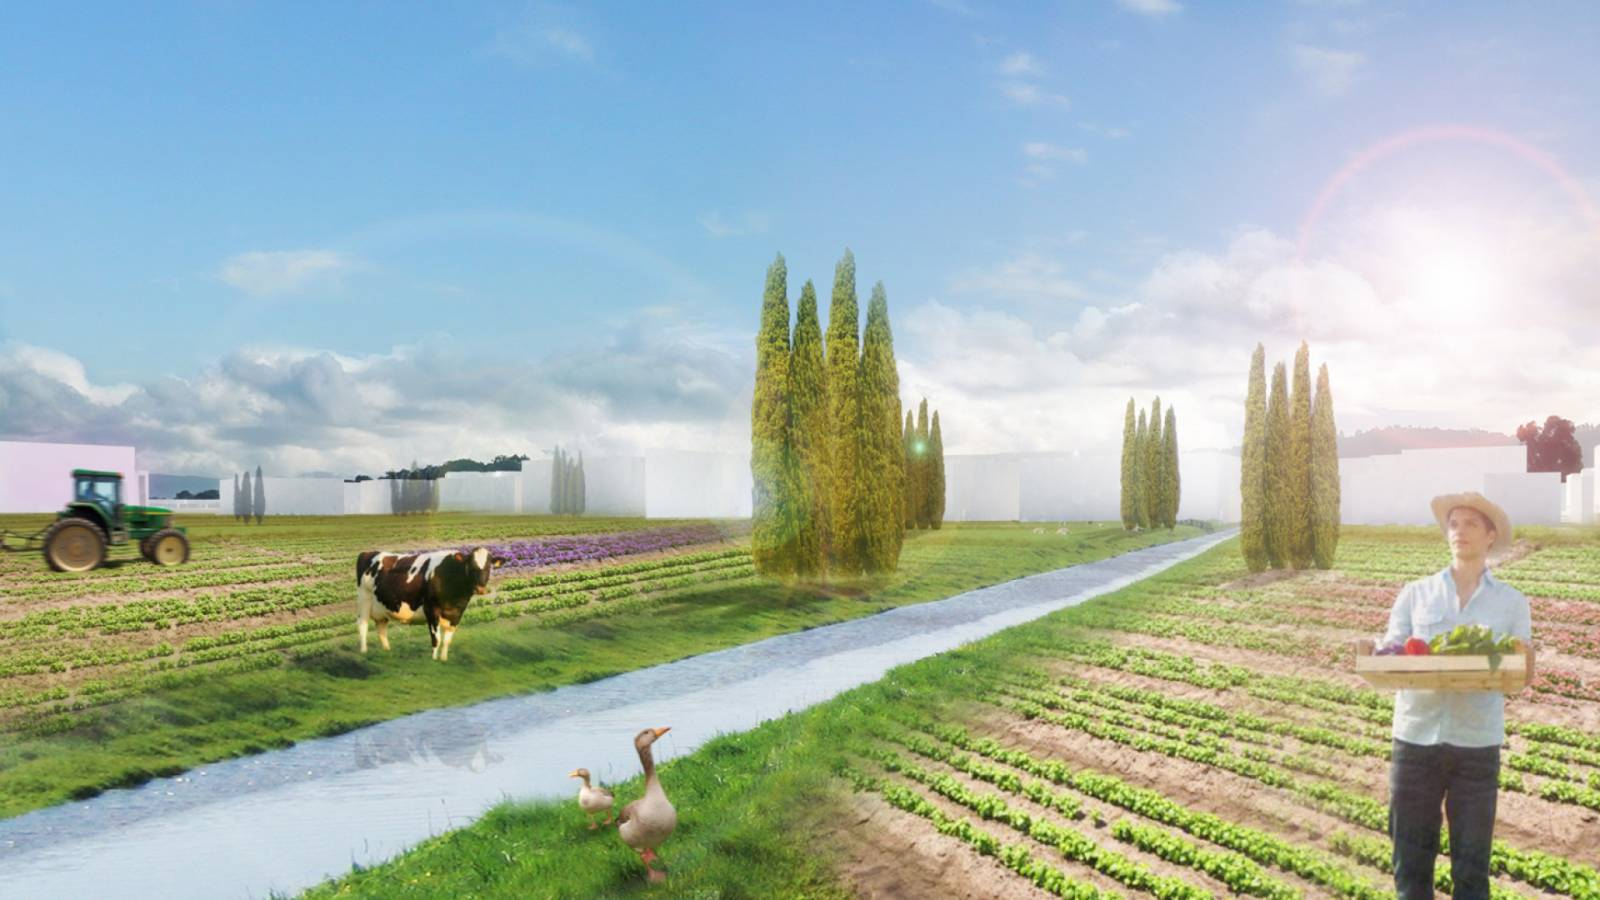 ECO VILLAGE VIEW - Velika Plaza Masterplan - SPOL Architects